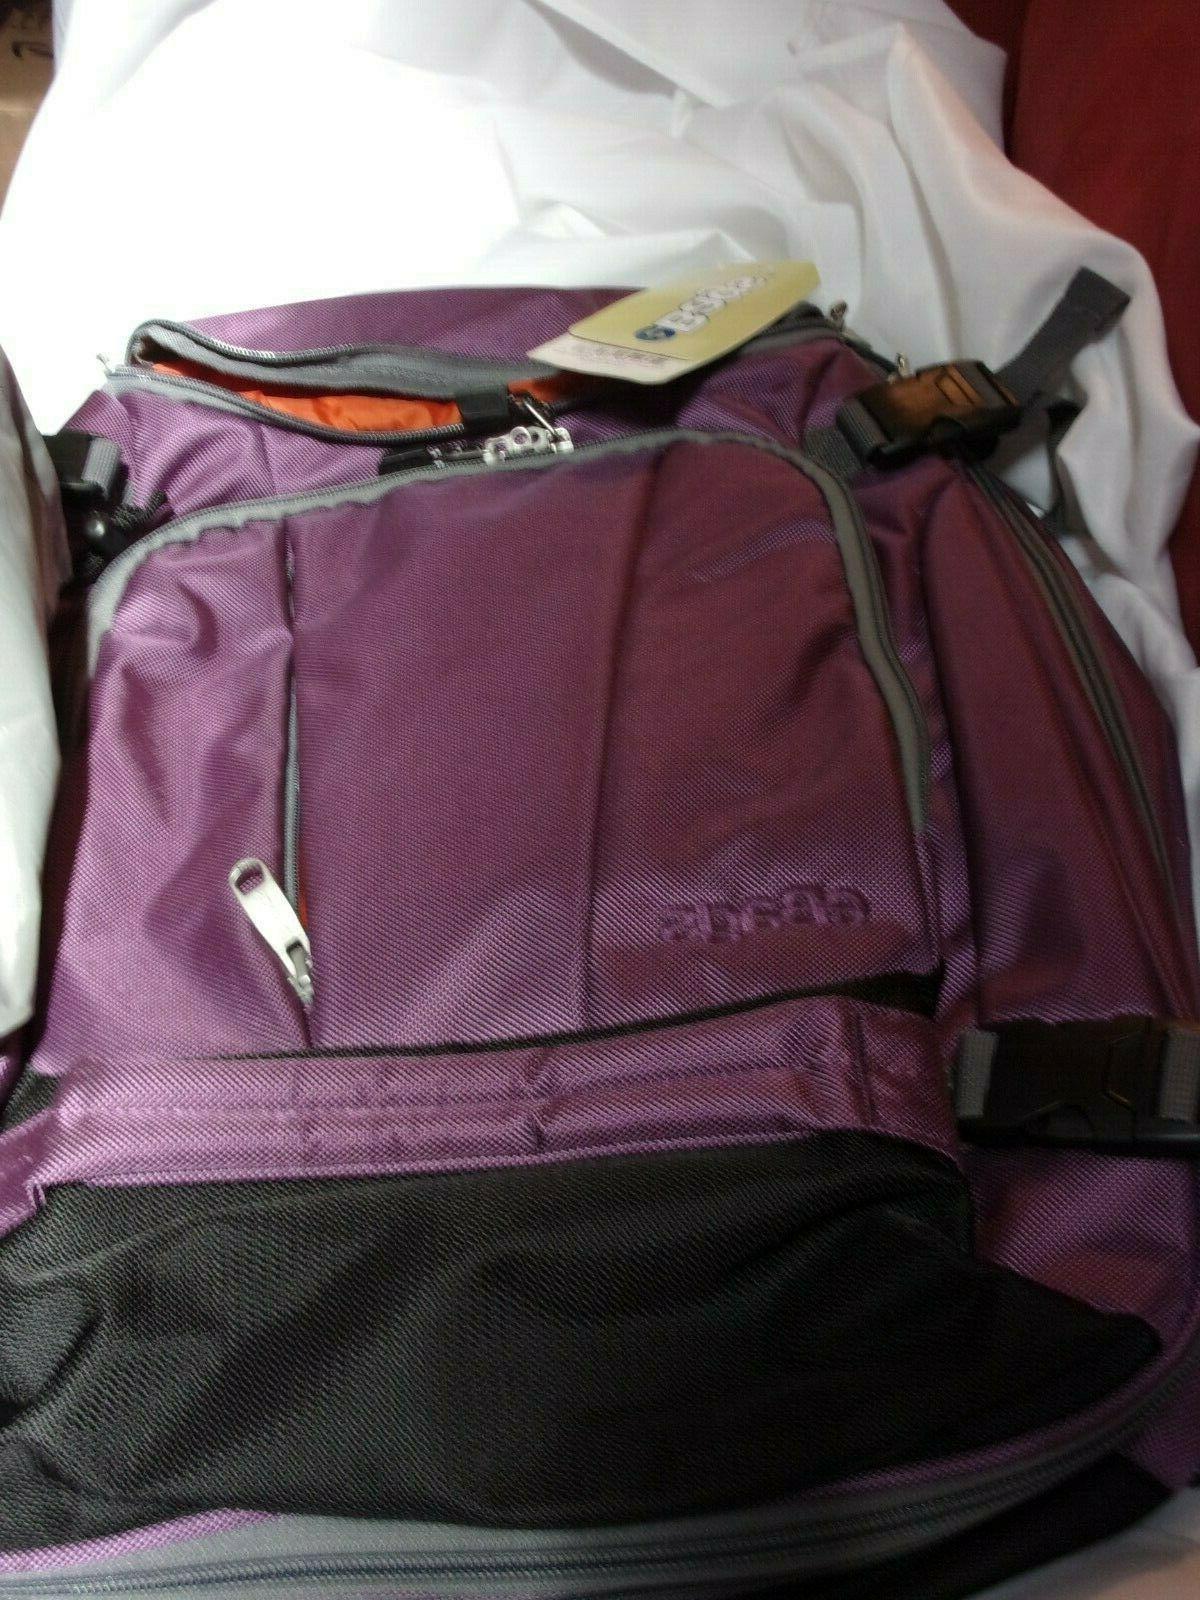 eggplant purple travel laptop daypack bagpack bag